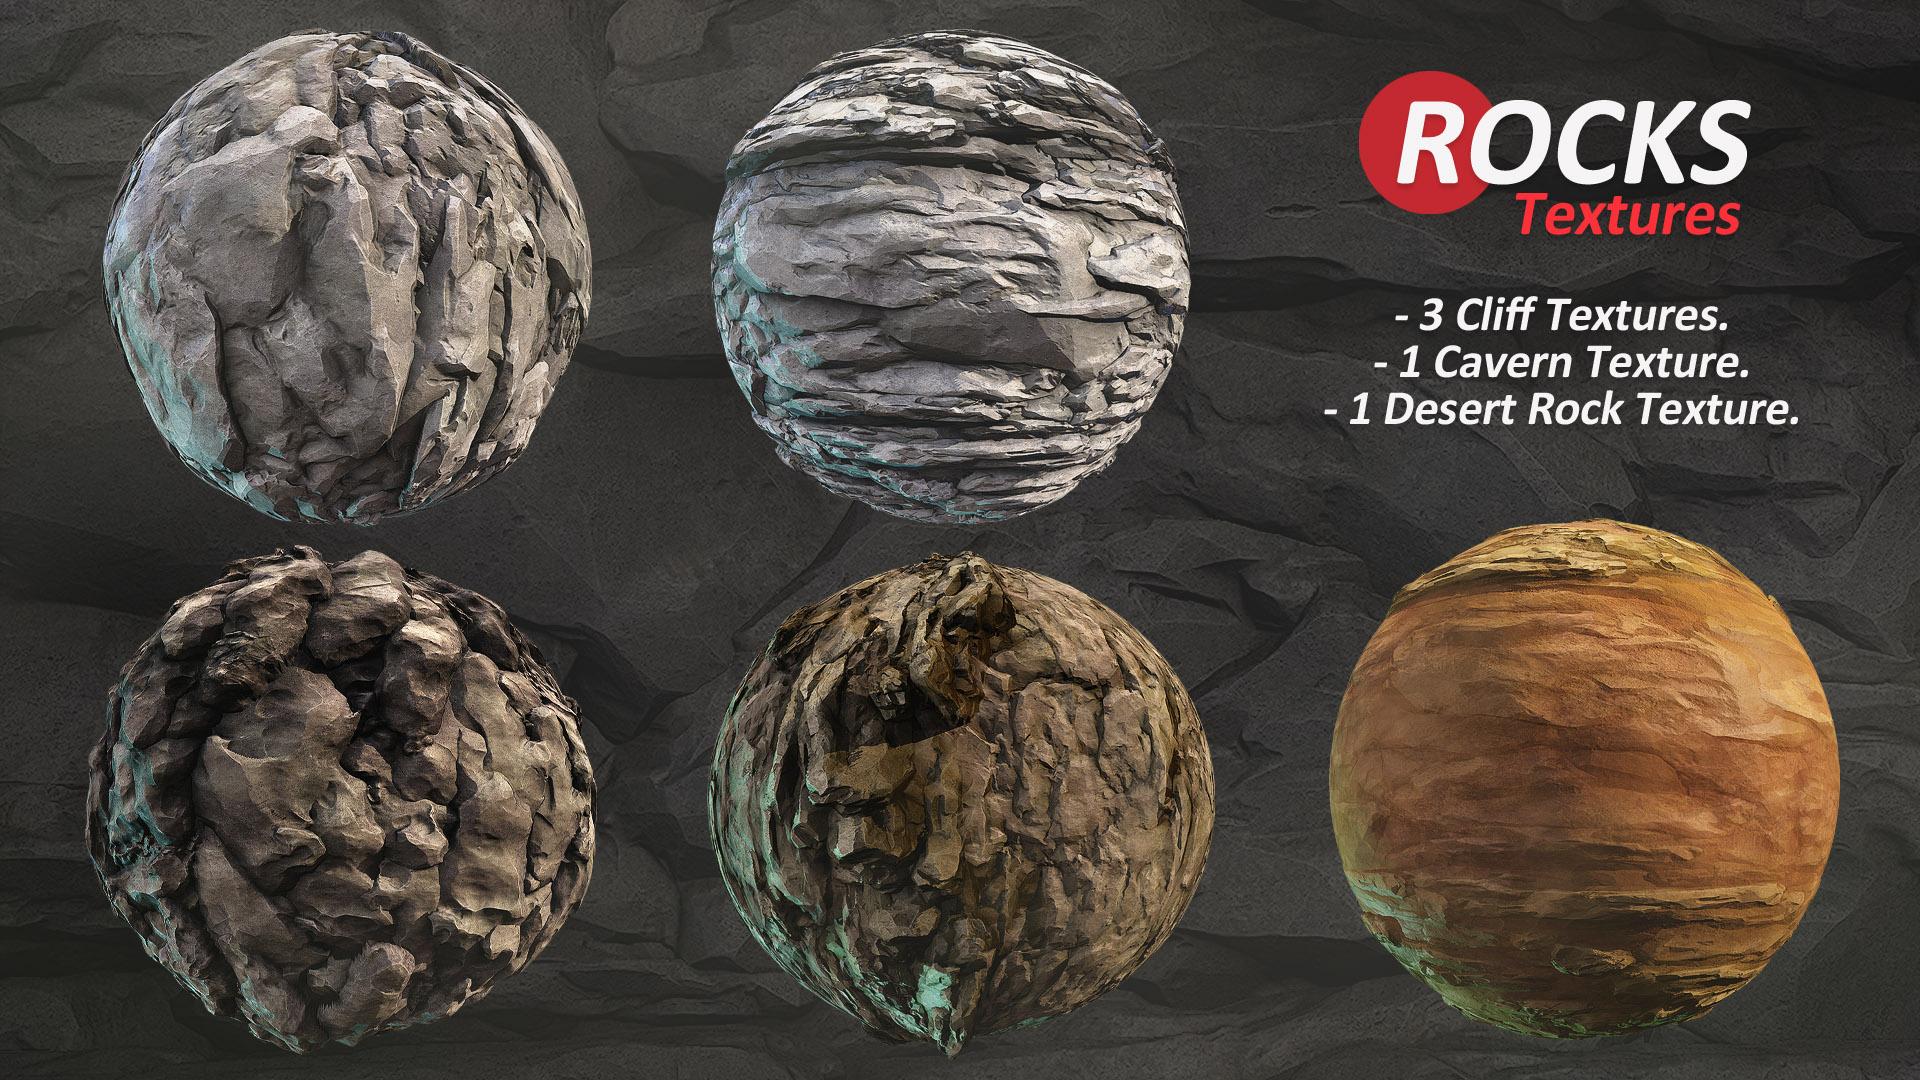 rock_stone_sculpted_textures_00.jpg